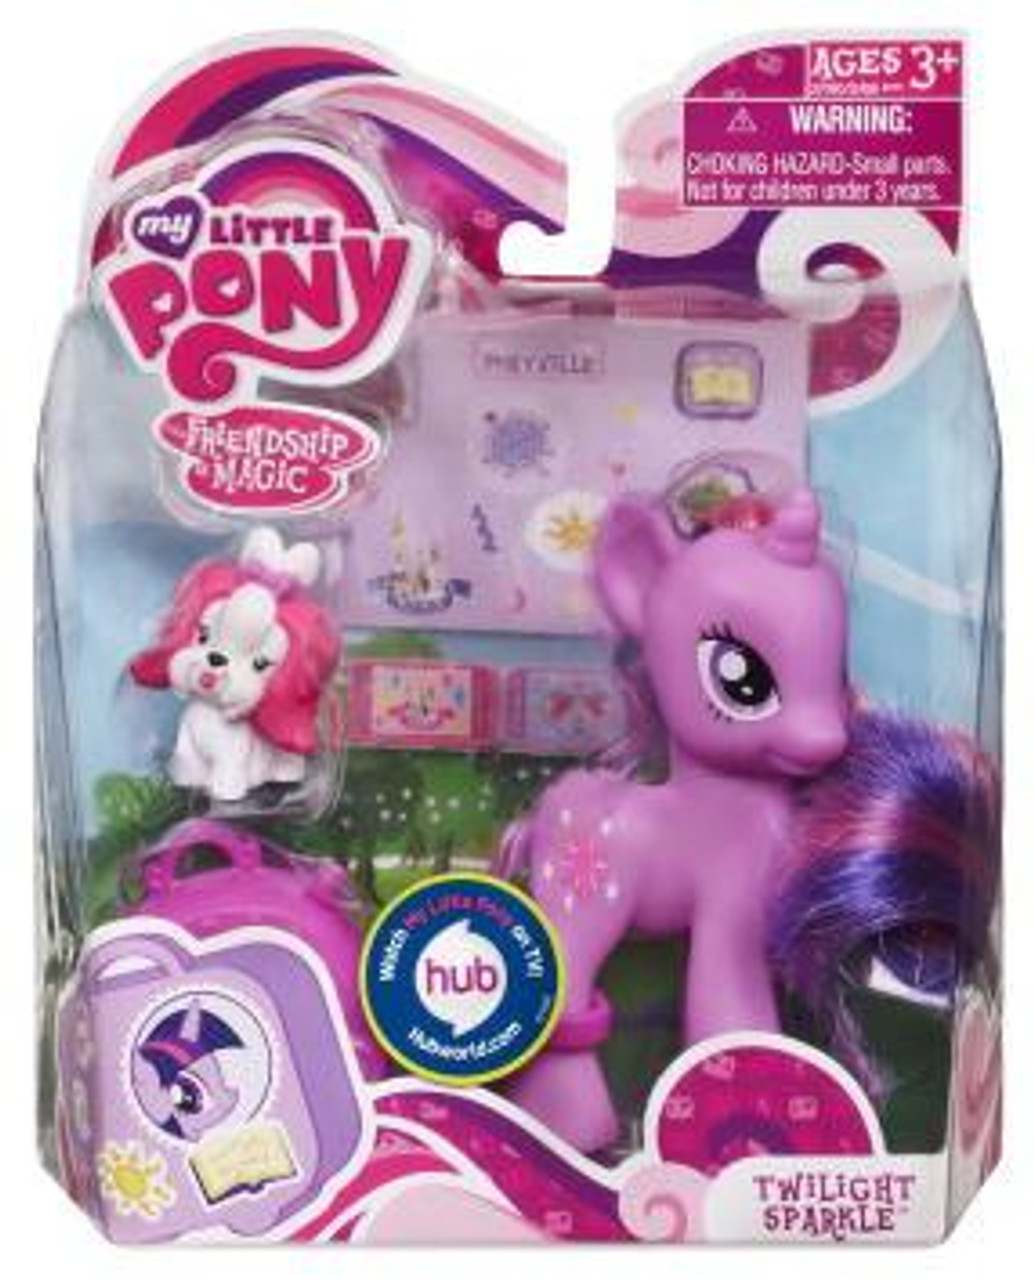 My Little Pony Friendship is Magic Basic Figures Twilight Sparkle Figure #37060 [With Suitcase]